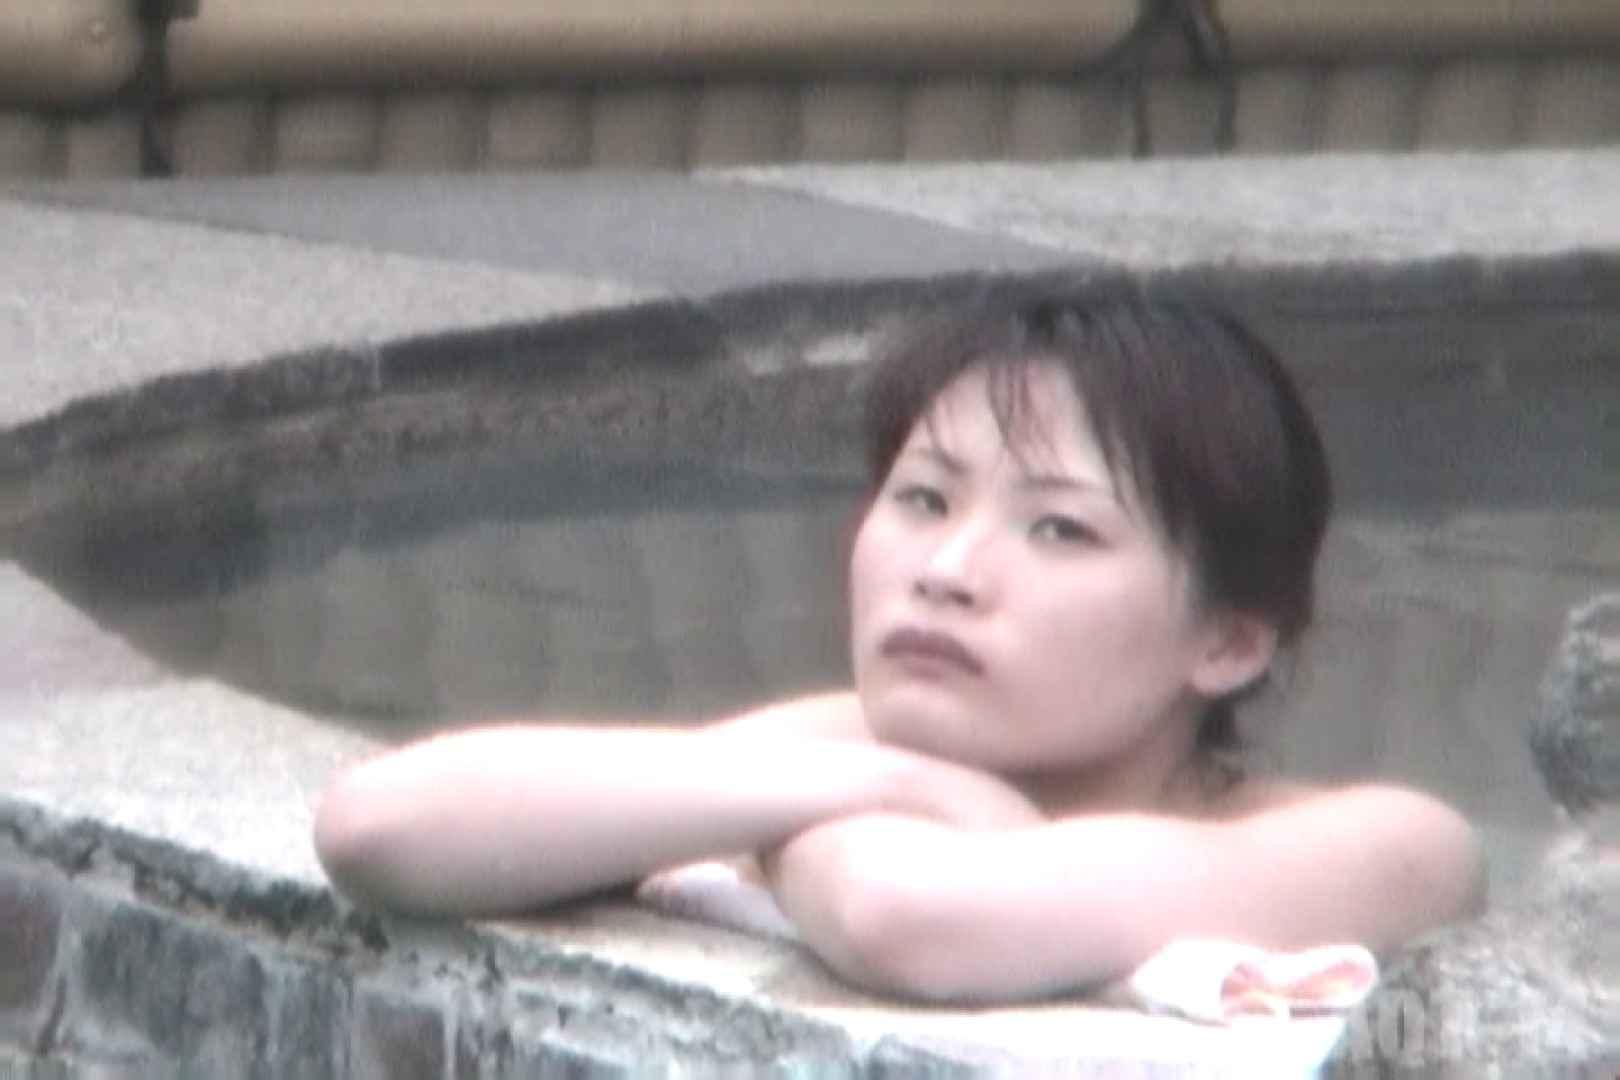 Aquaな露天風呂Vol.822 盗撮大放出 エロ無料画像 98連発 34